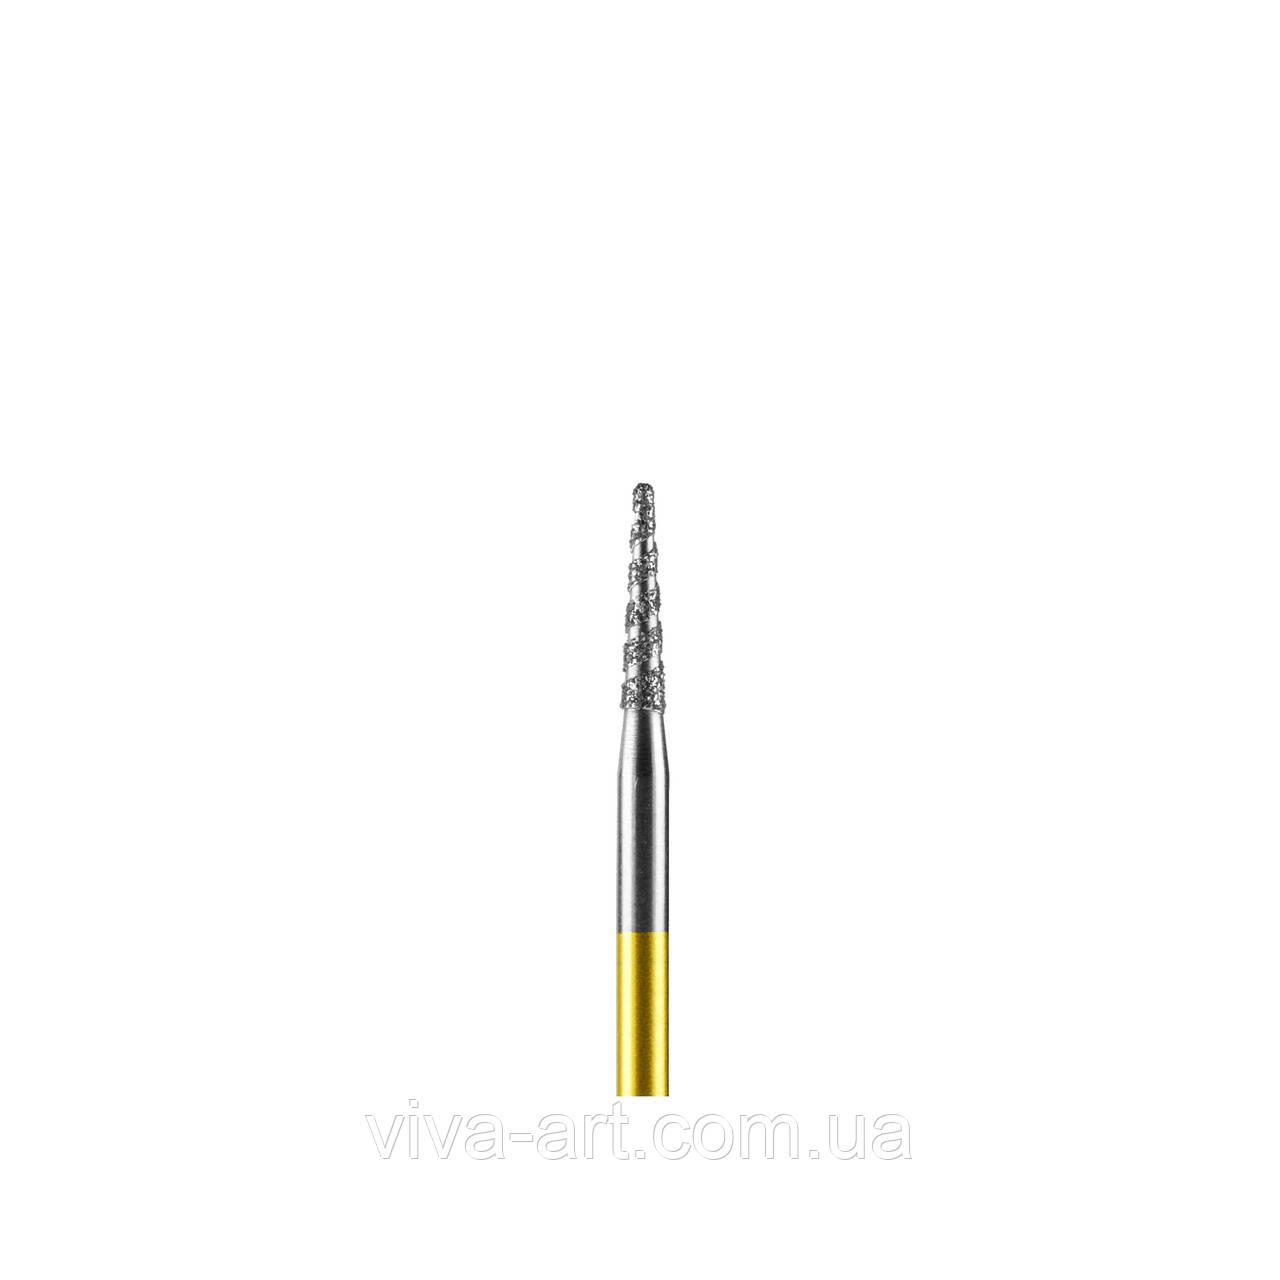 Алмазная насадка конус турбо, 1.8 мм, средний абразив, Diaswiss (Швейцария)